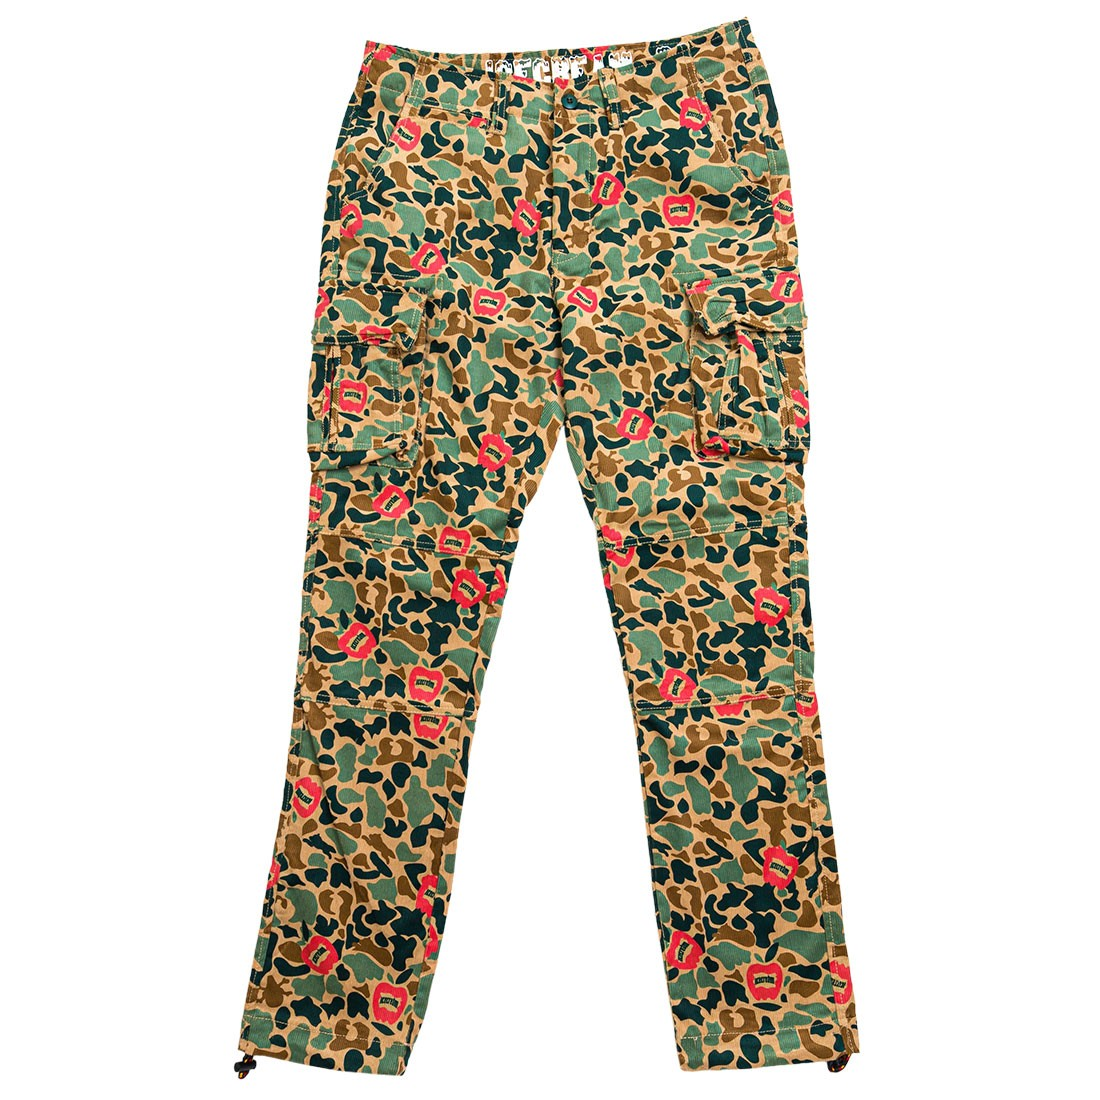 Ice Cream Men Apple Pants (camo / brown / green)